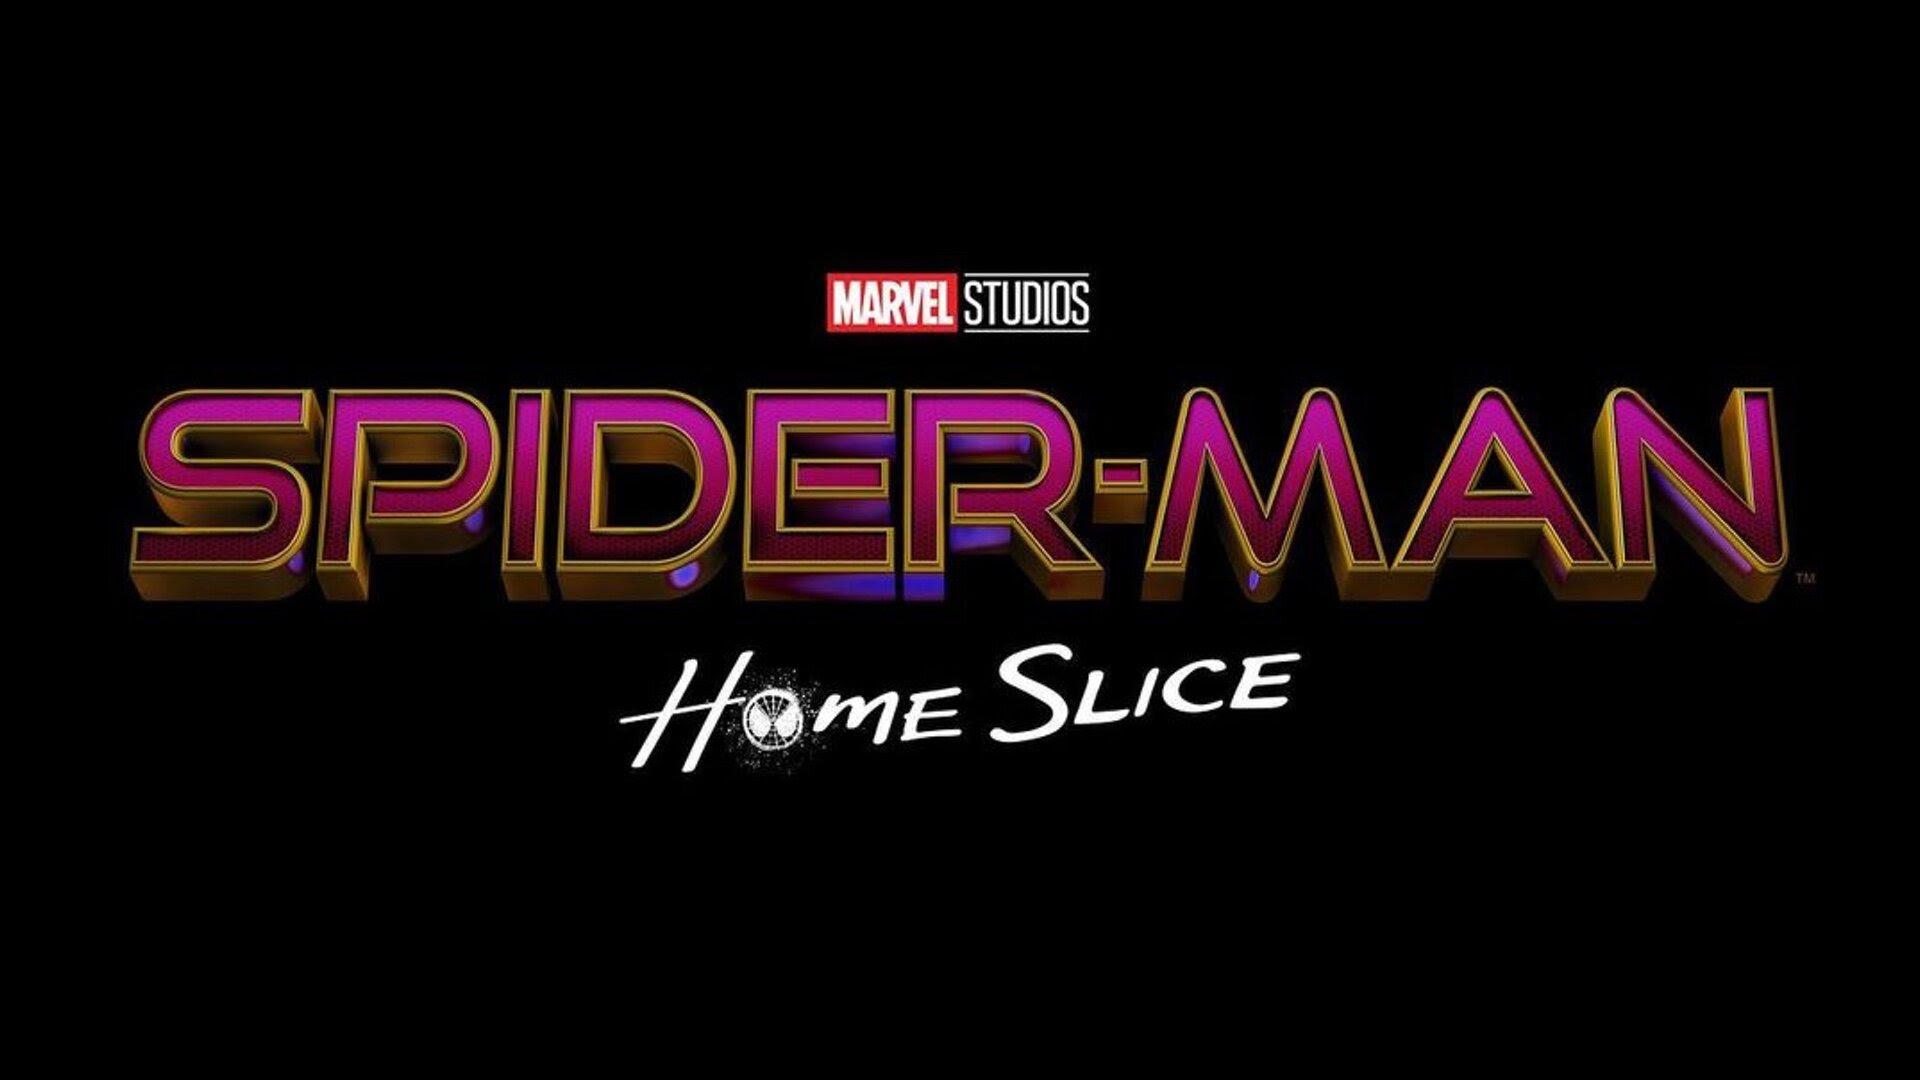 Zendaya Reveals Her SPIDER-MAN: HOME SLICE Title Card and Photo — GeekTyrant